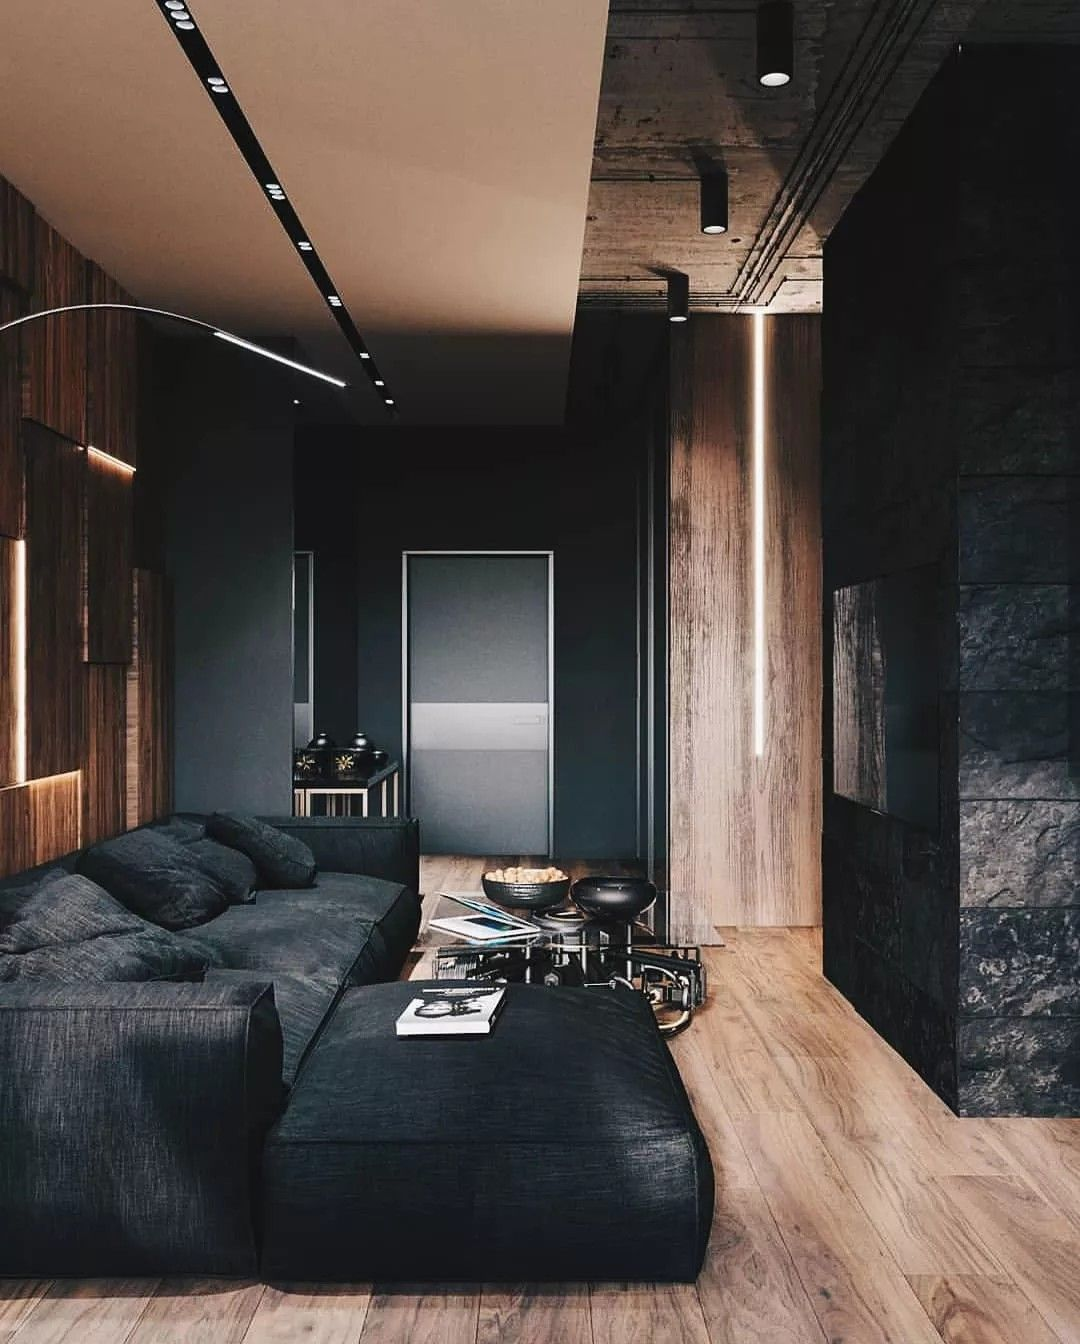 Moody Interiors Interior Inspiration Minimalism Interior